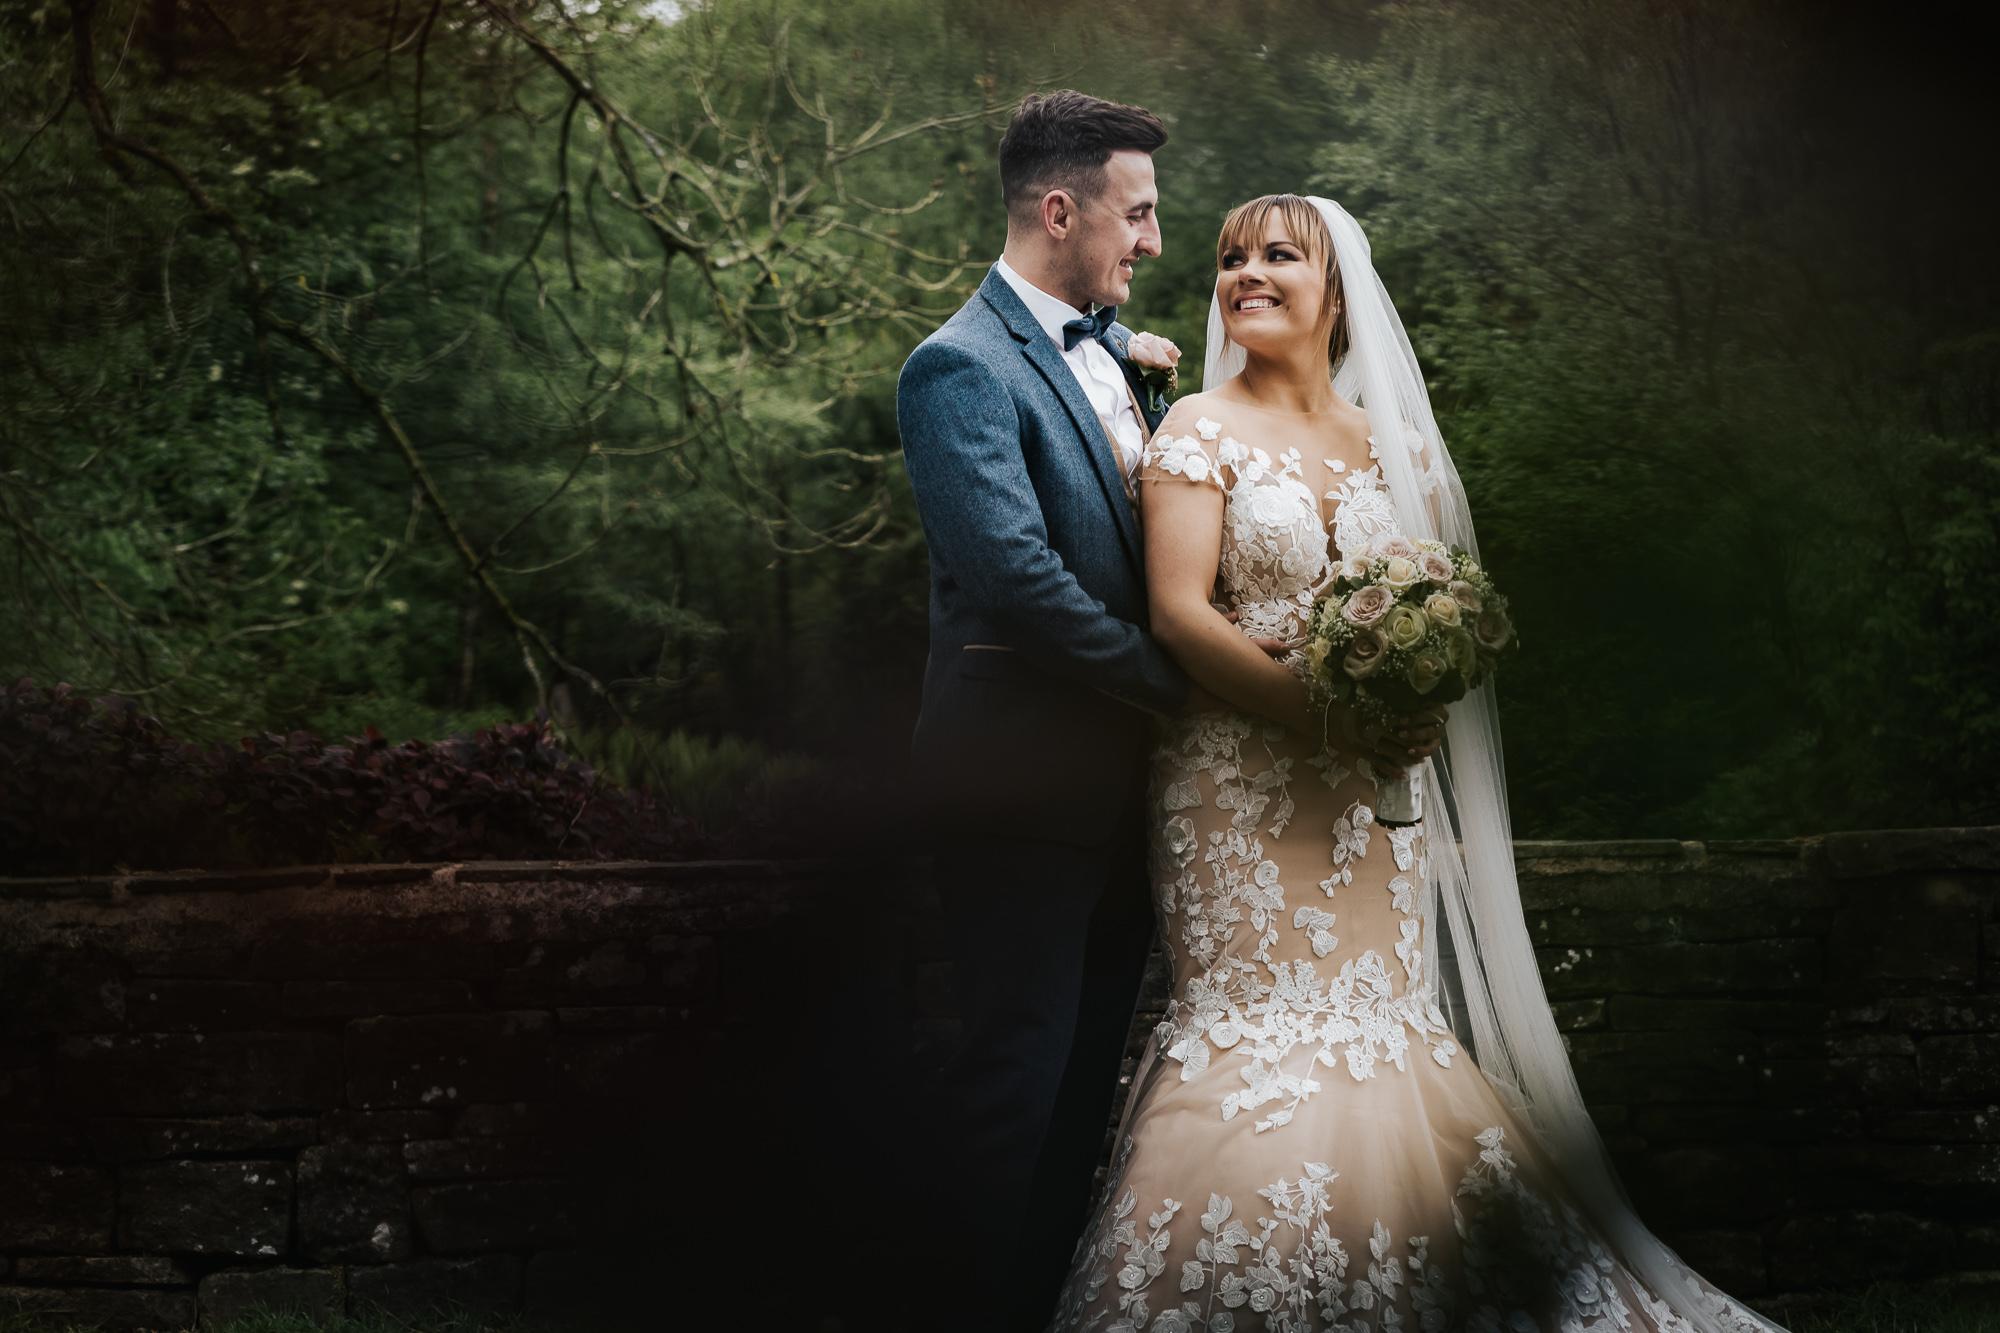 Rivington Hall Barn Wedding PHotographer lancashire wedding photography (25 of 34).jpg